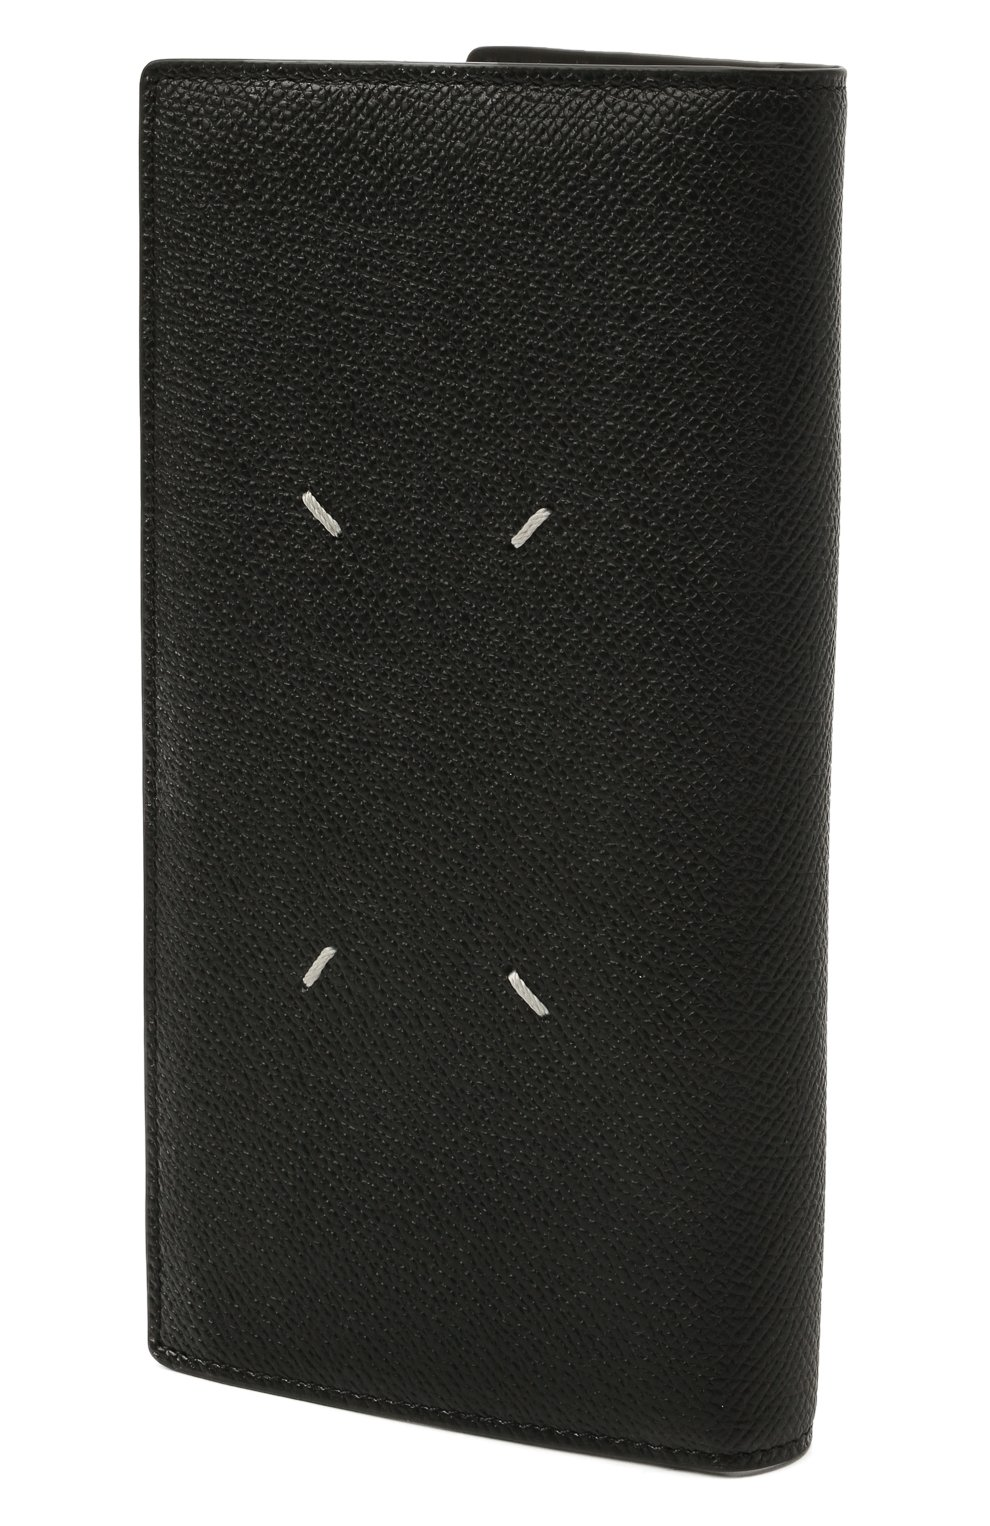 Мужской кожаное портмоне MAISON MARGIELA черного цвета, арт. S55UI0202/P0399 | Фото 2